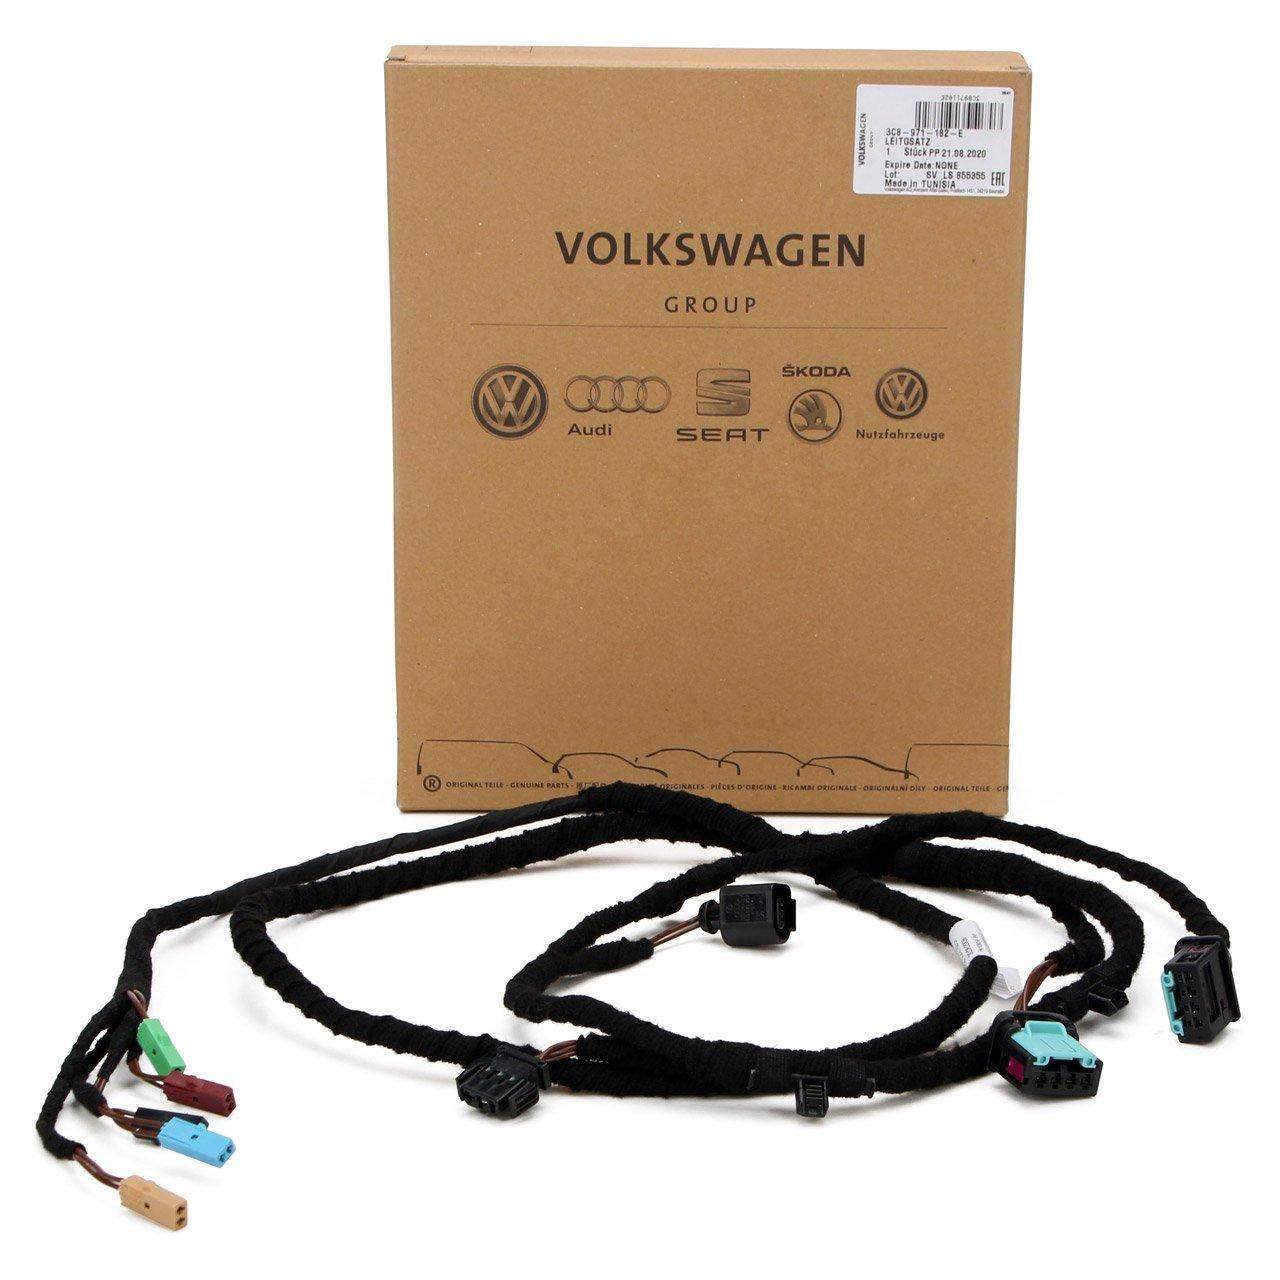 ORIGINAL VW Leitungssatz-Heckdeckel ohne Rückfahrkamera Passat CC (357) links 3C8971182E